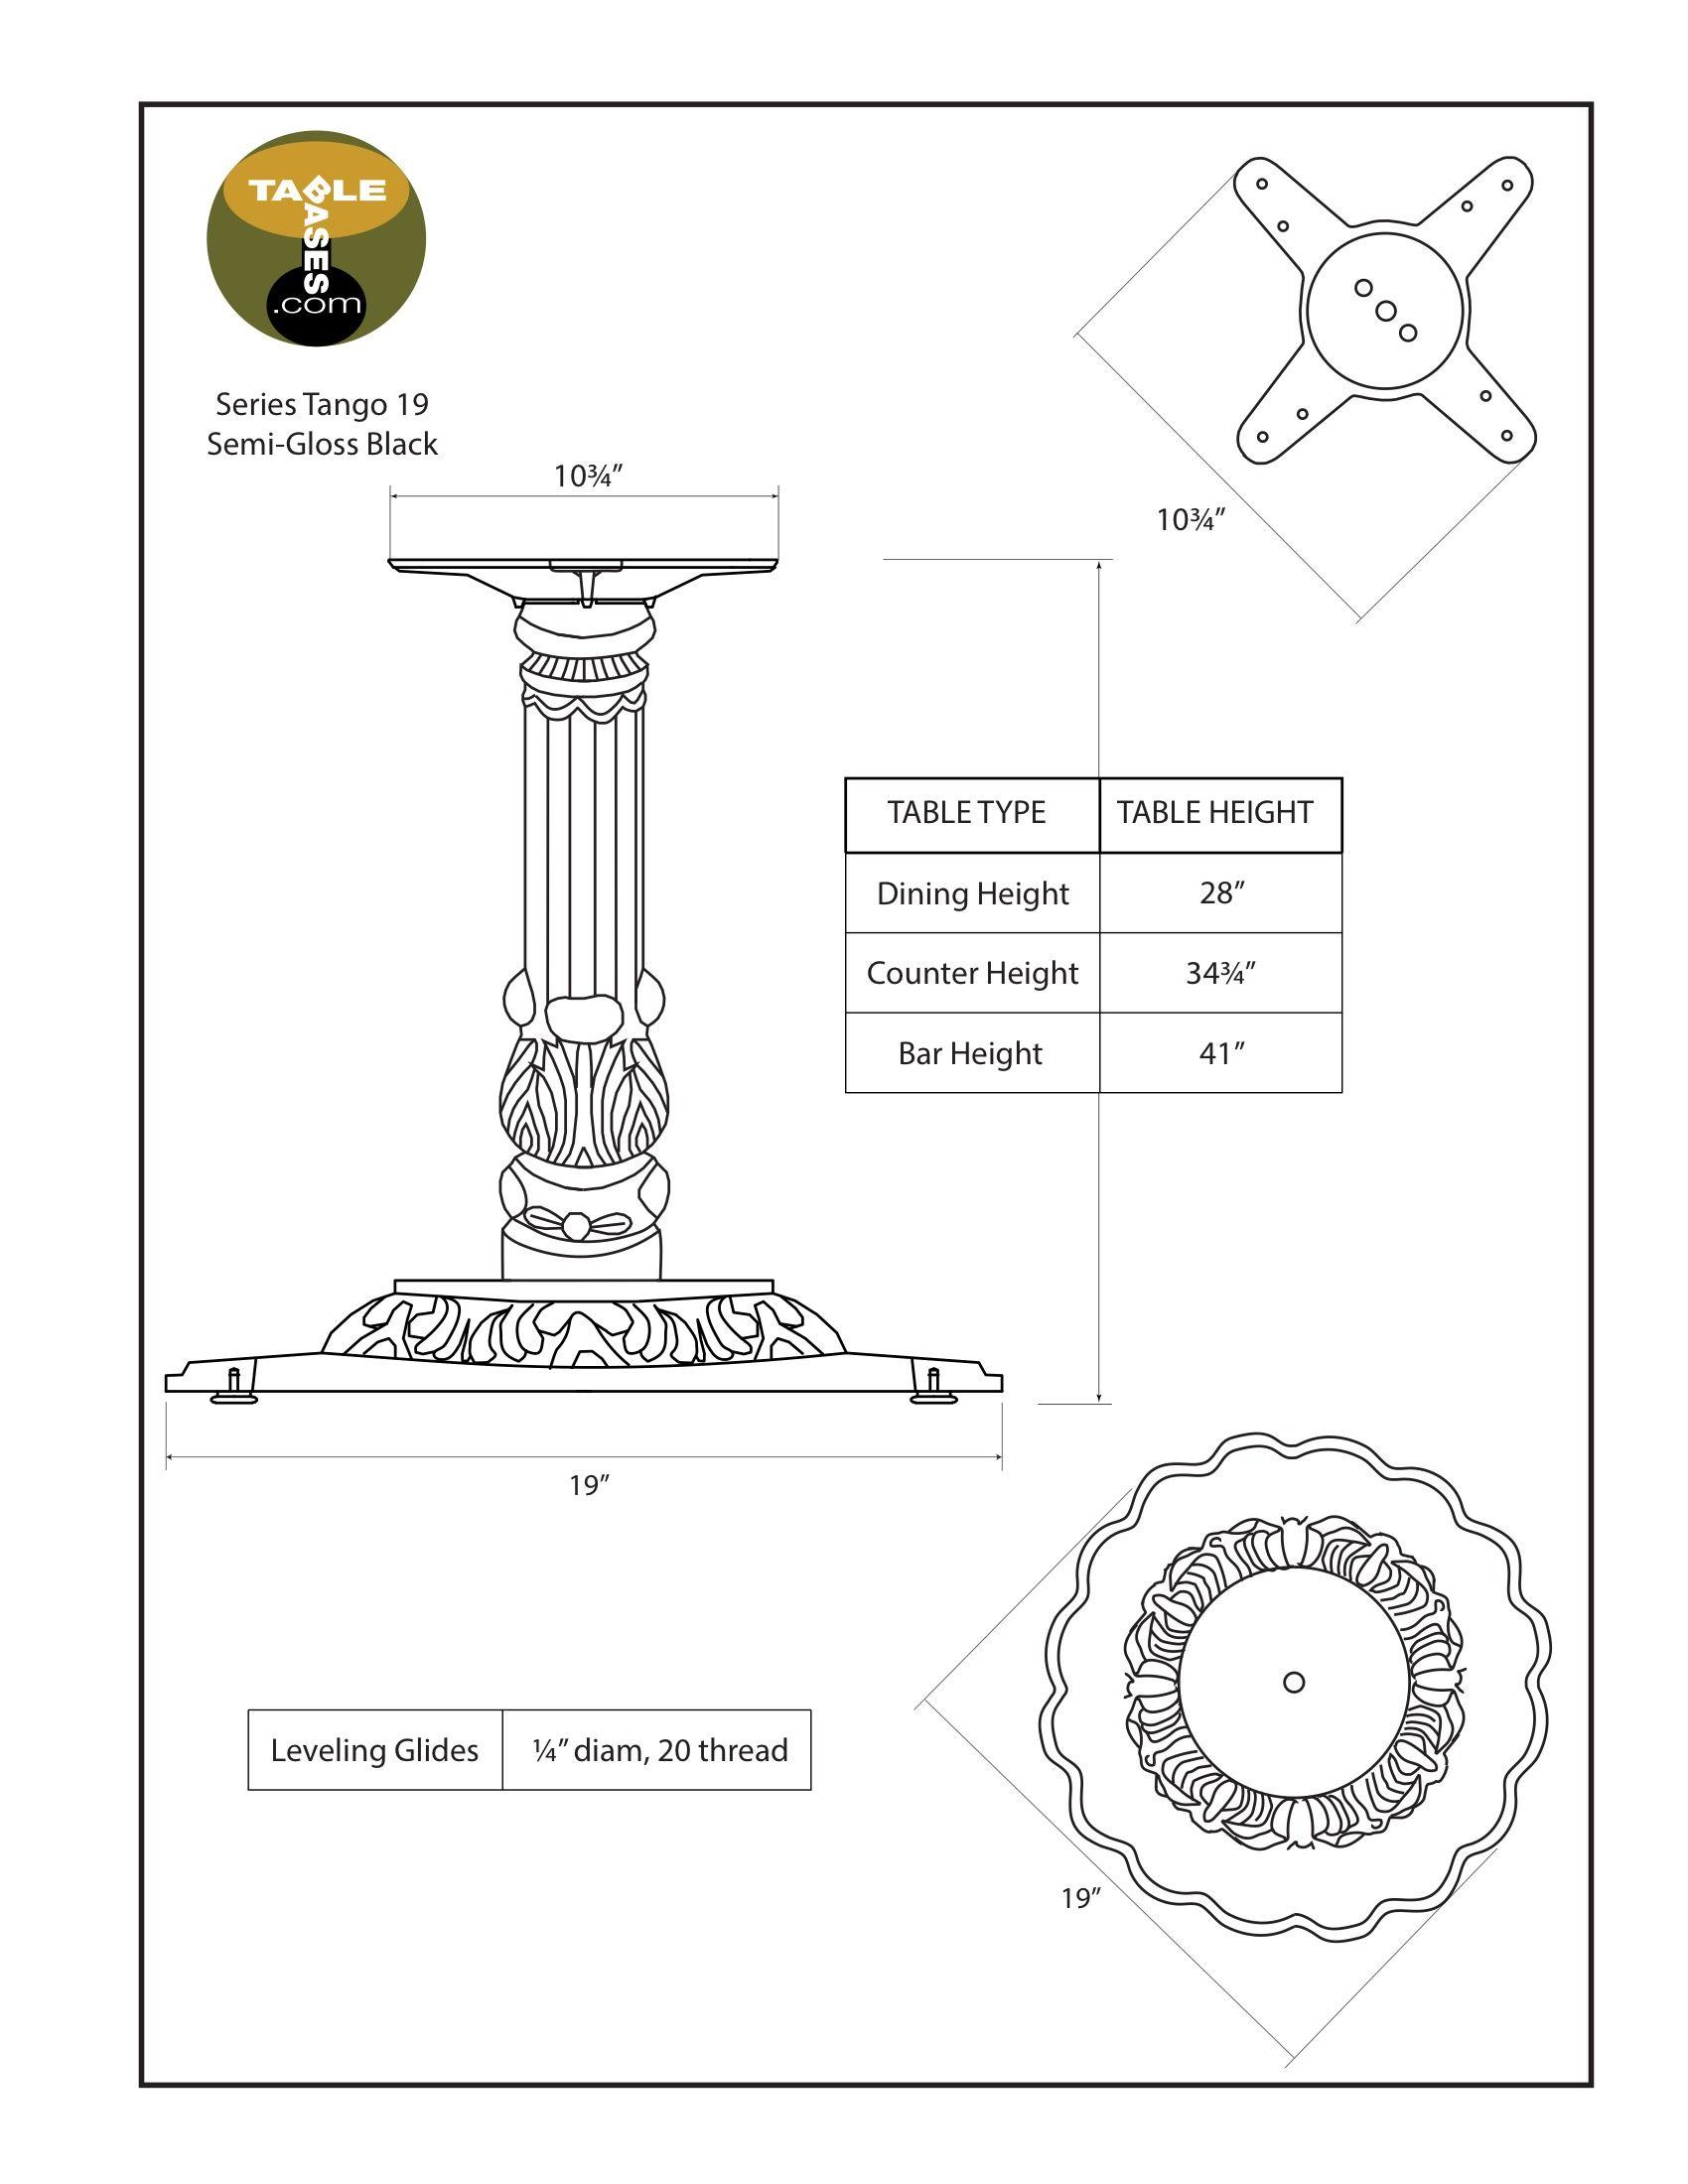 Tango-19 Semi-Gloss Black Table Base - Specifications